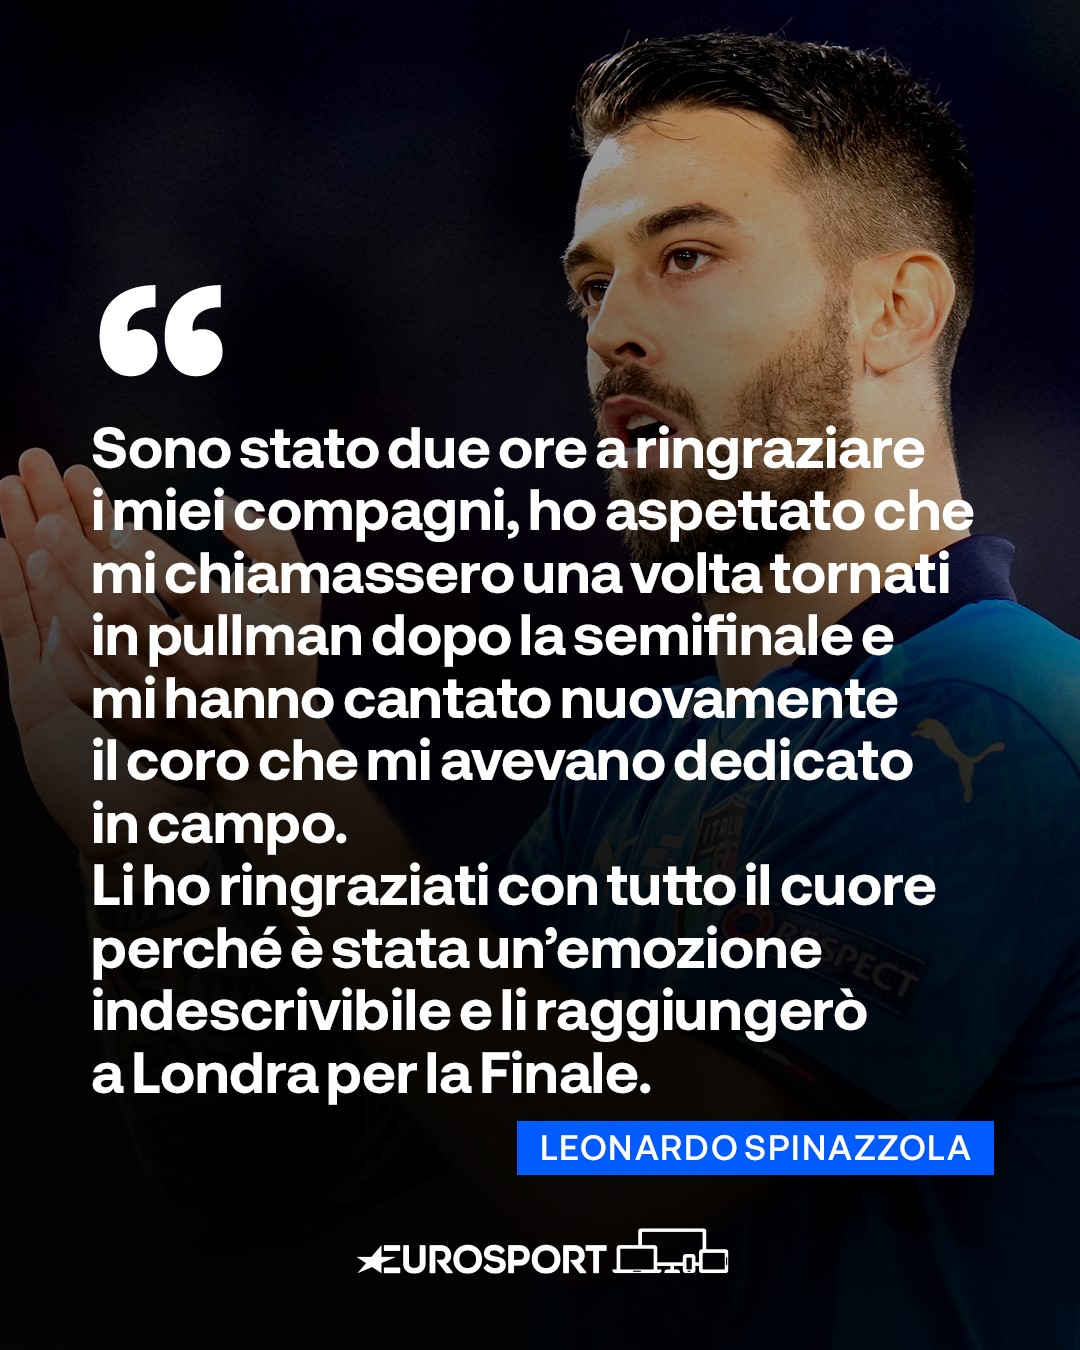 https://i.eurosport.com/2021/07/10/3170687.jpg